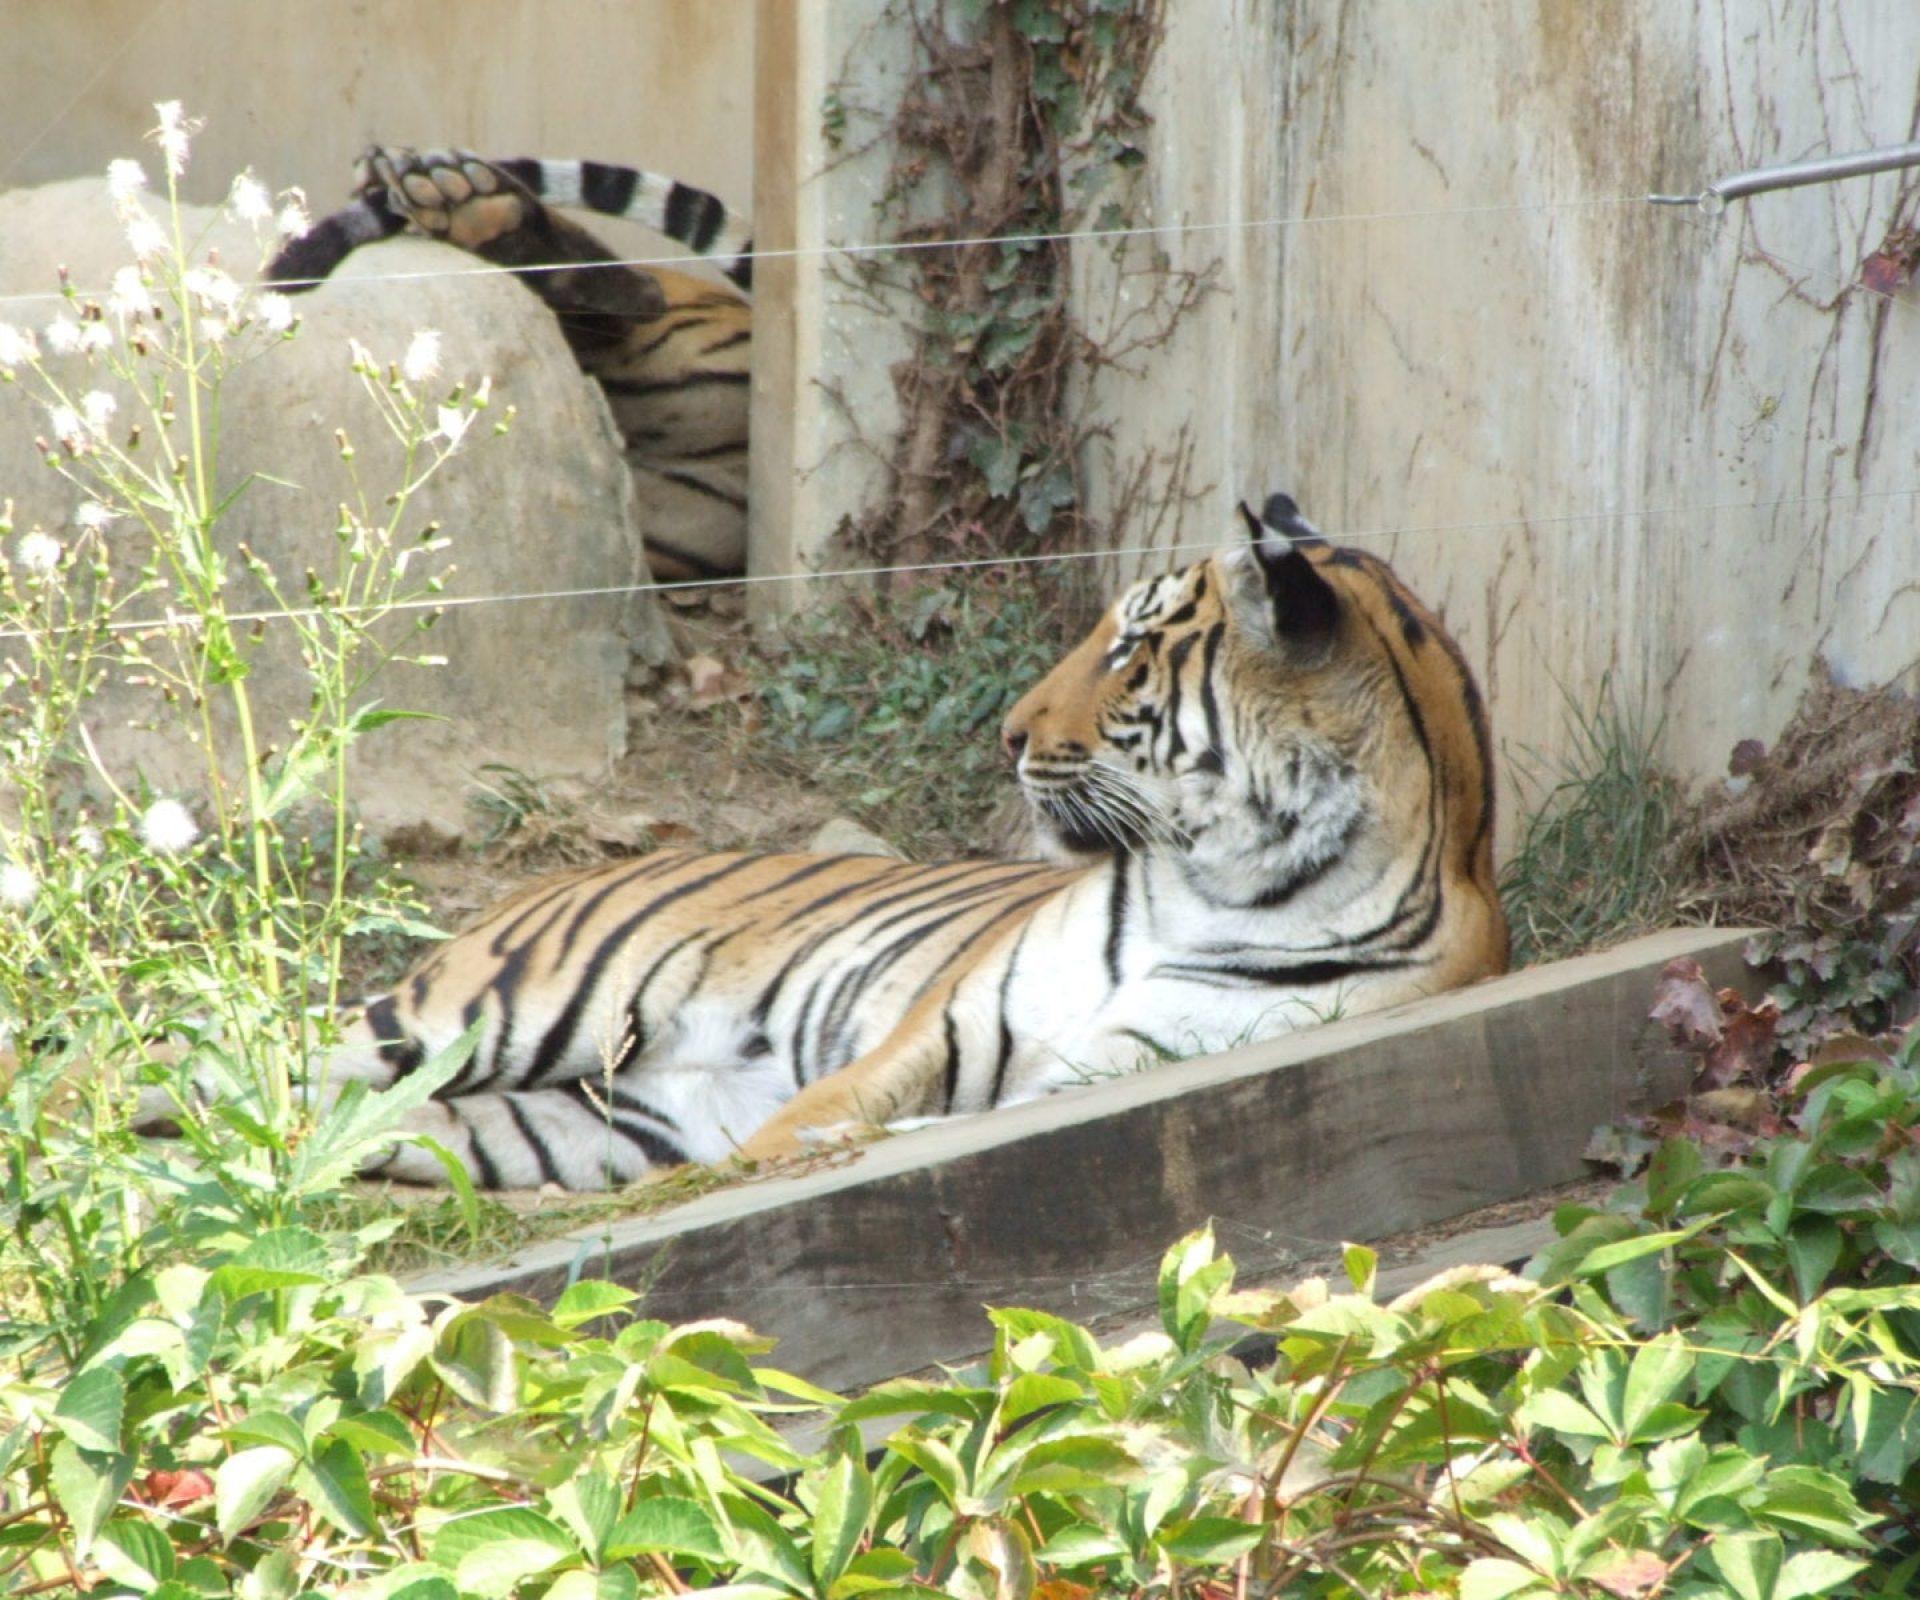 Seoul Grand Zoo | Gwacheon-si, Gyeonggi-do